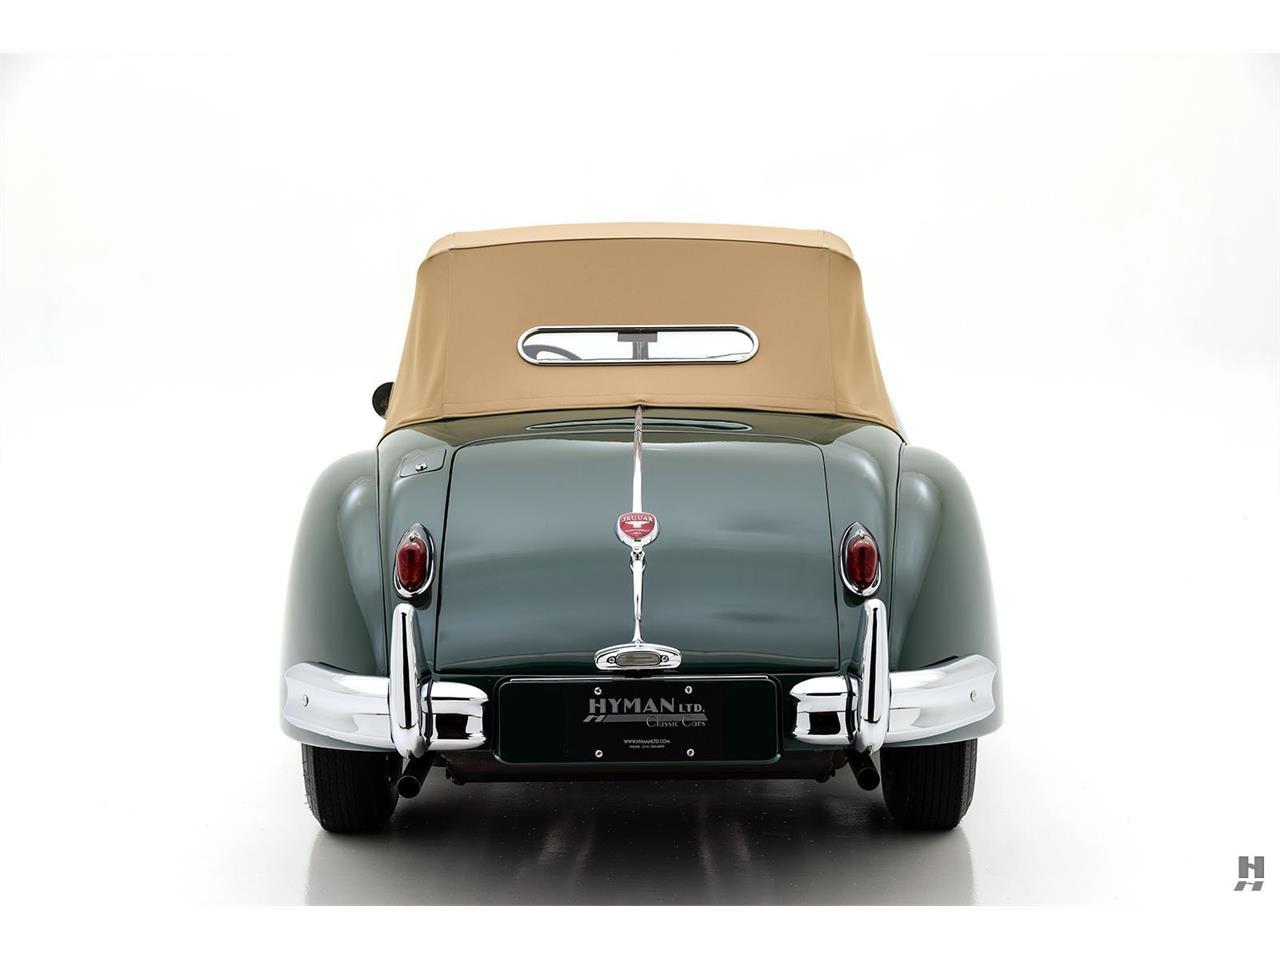 1956 Jaguar Xk140 For Sale Cc 1148226 Wiring Diagram Large Picture Of 56 Olz6